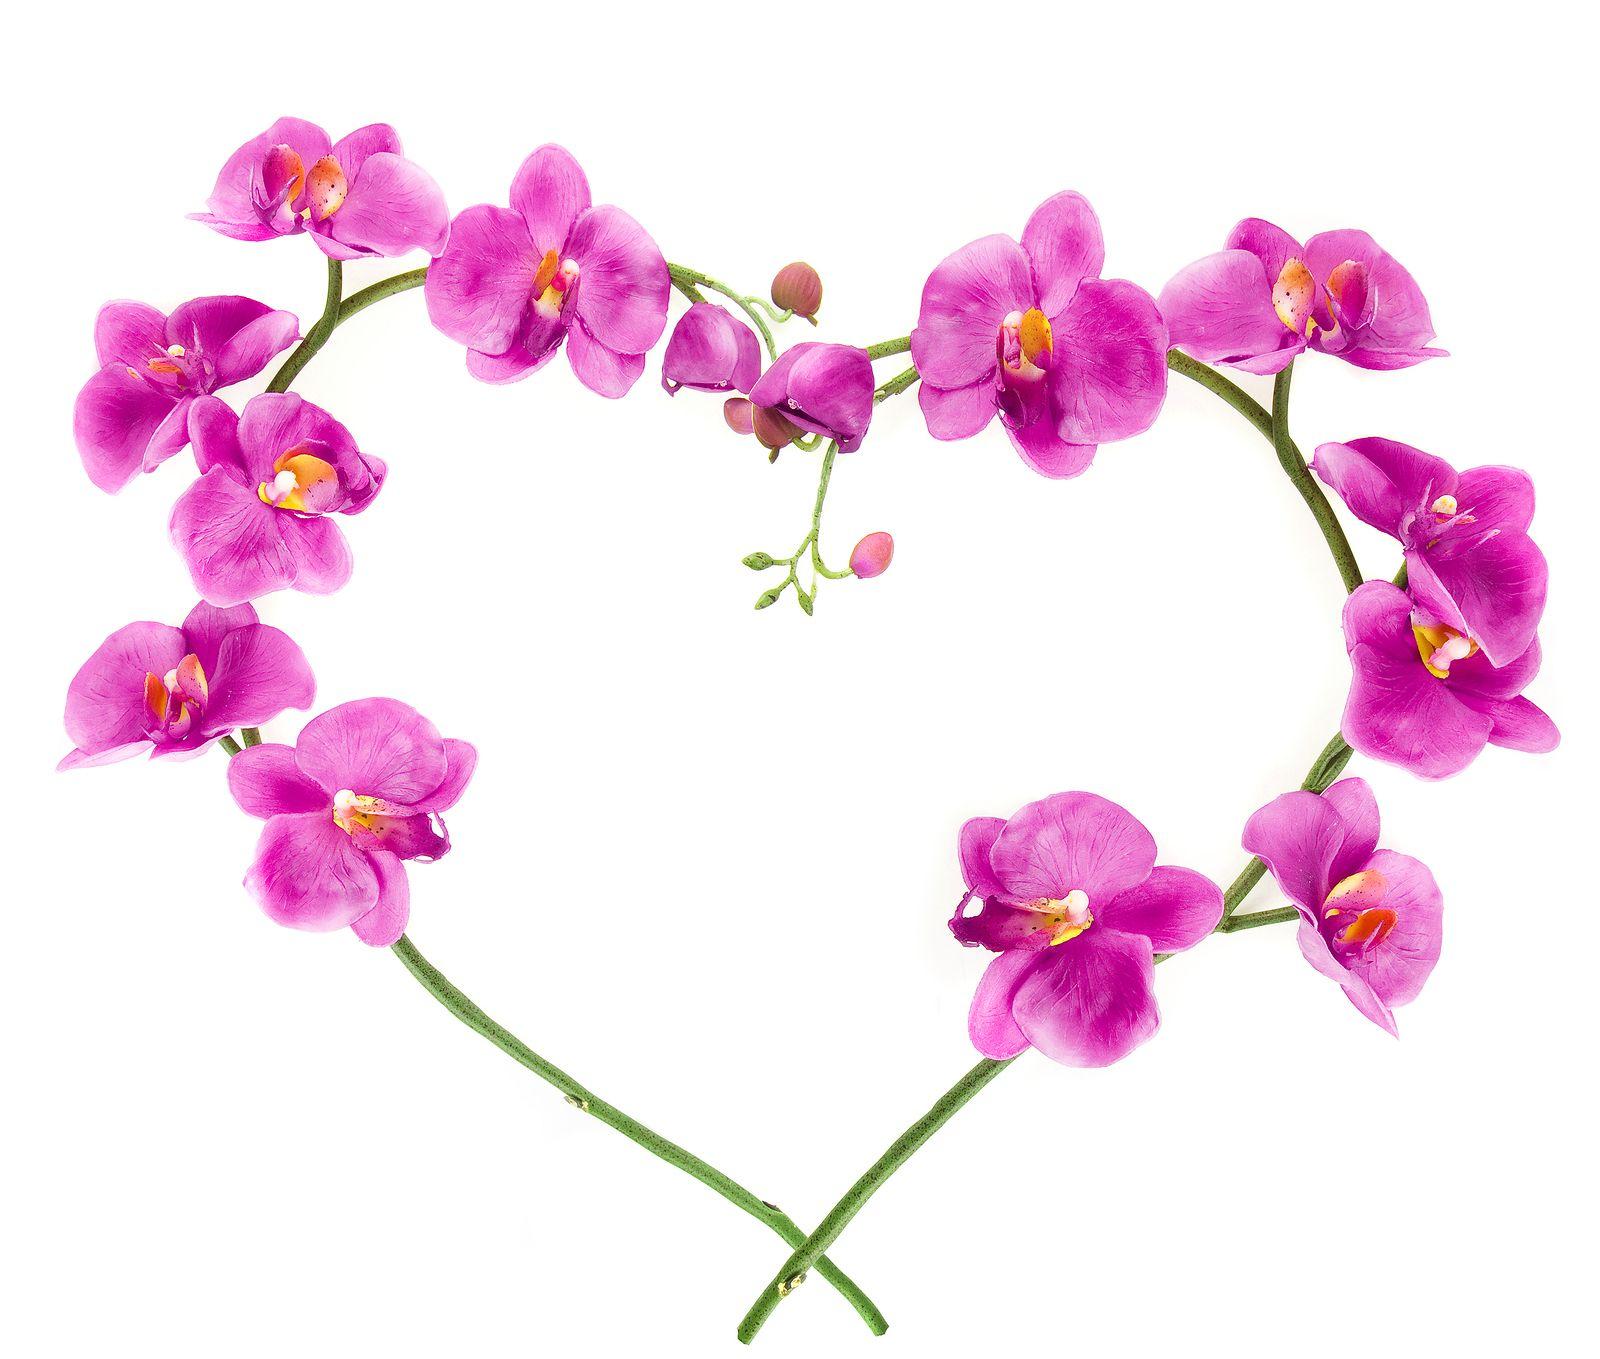 Orchid Flower HD Wallpaper Flowers Cute Wallpapers Free